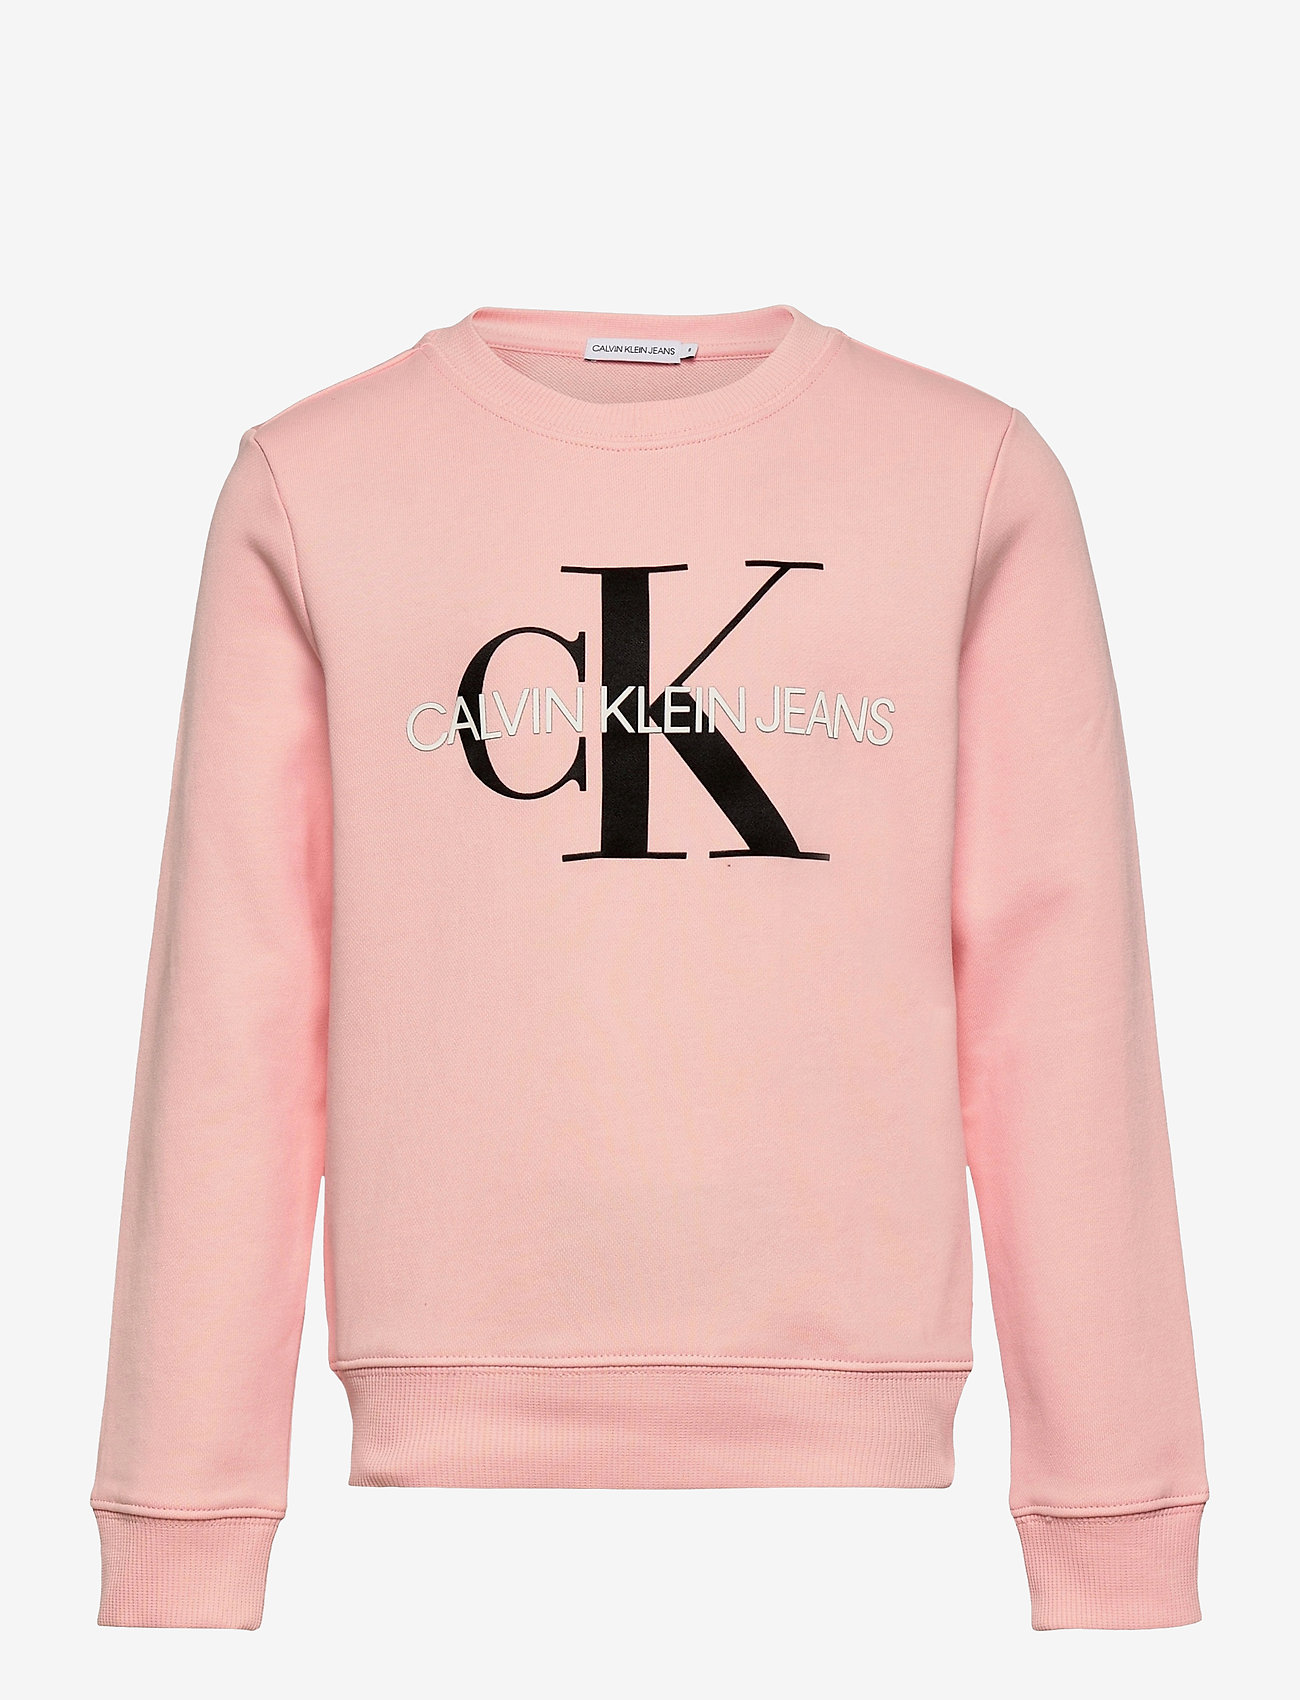 Calvin Klein - MONOGRAM LOGO SWEATSHIRT - sweatshirts - sand rose - 0